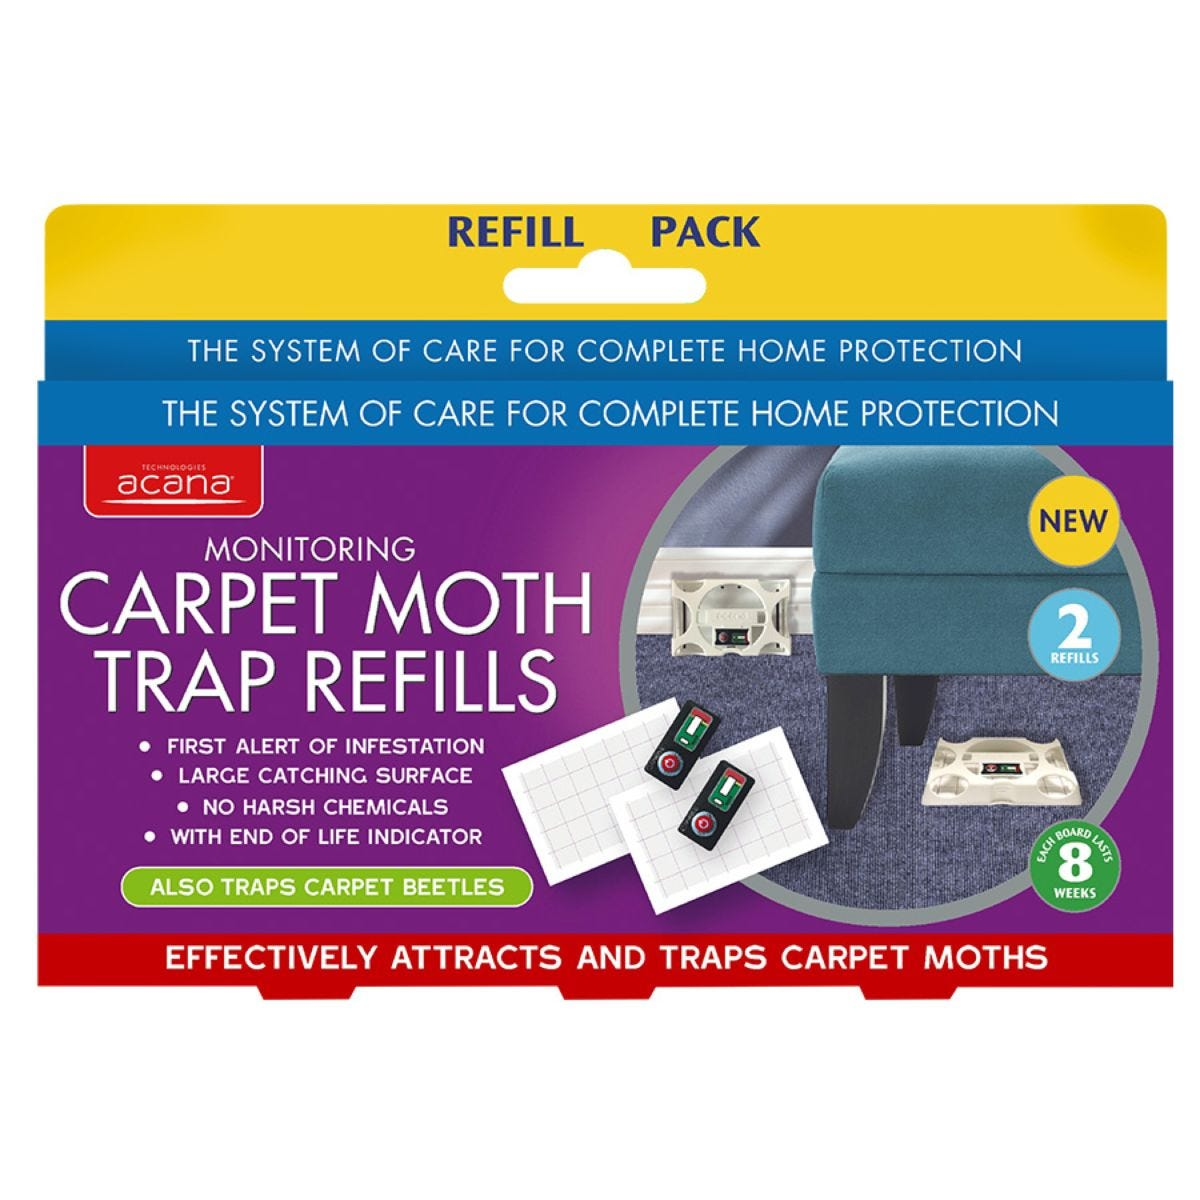 Acana Carpet Moth Trap Refills - Pack of 2